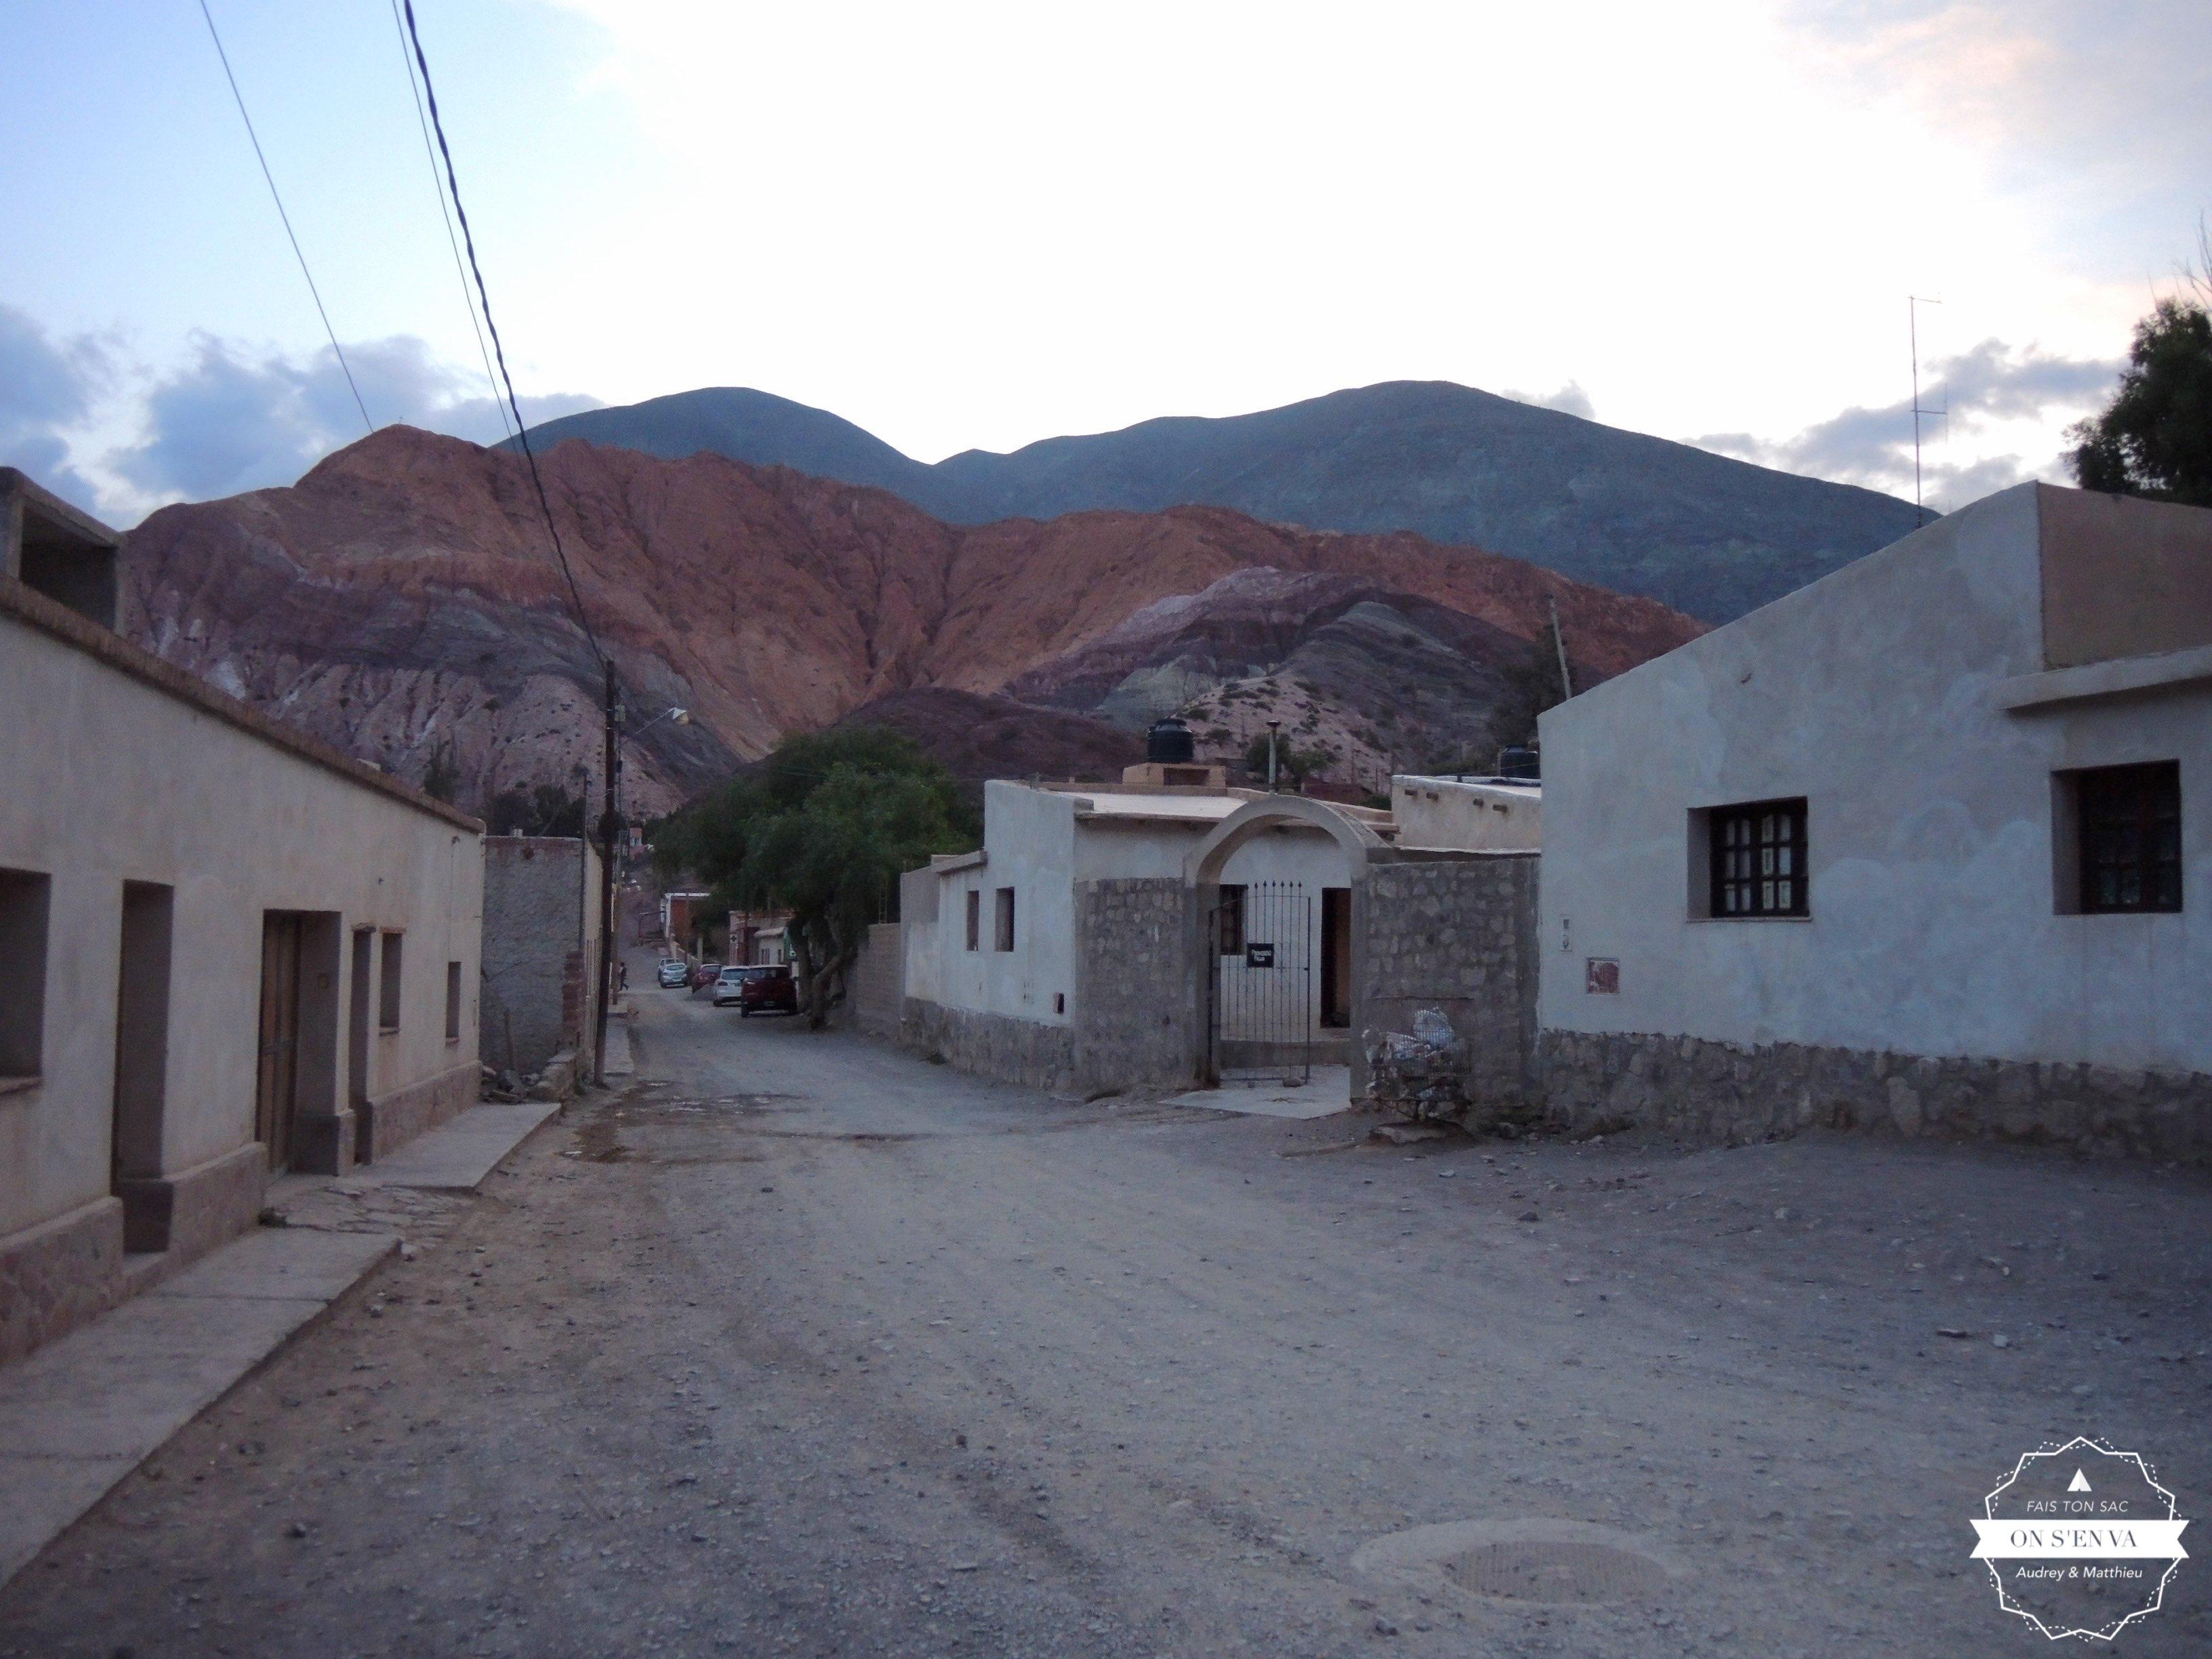 Première étape à Purmamarca